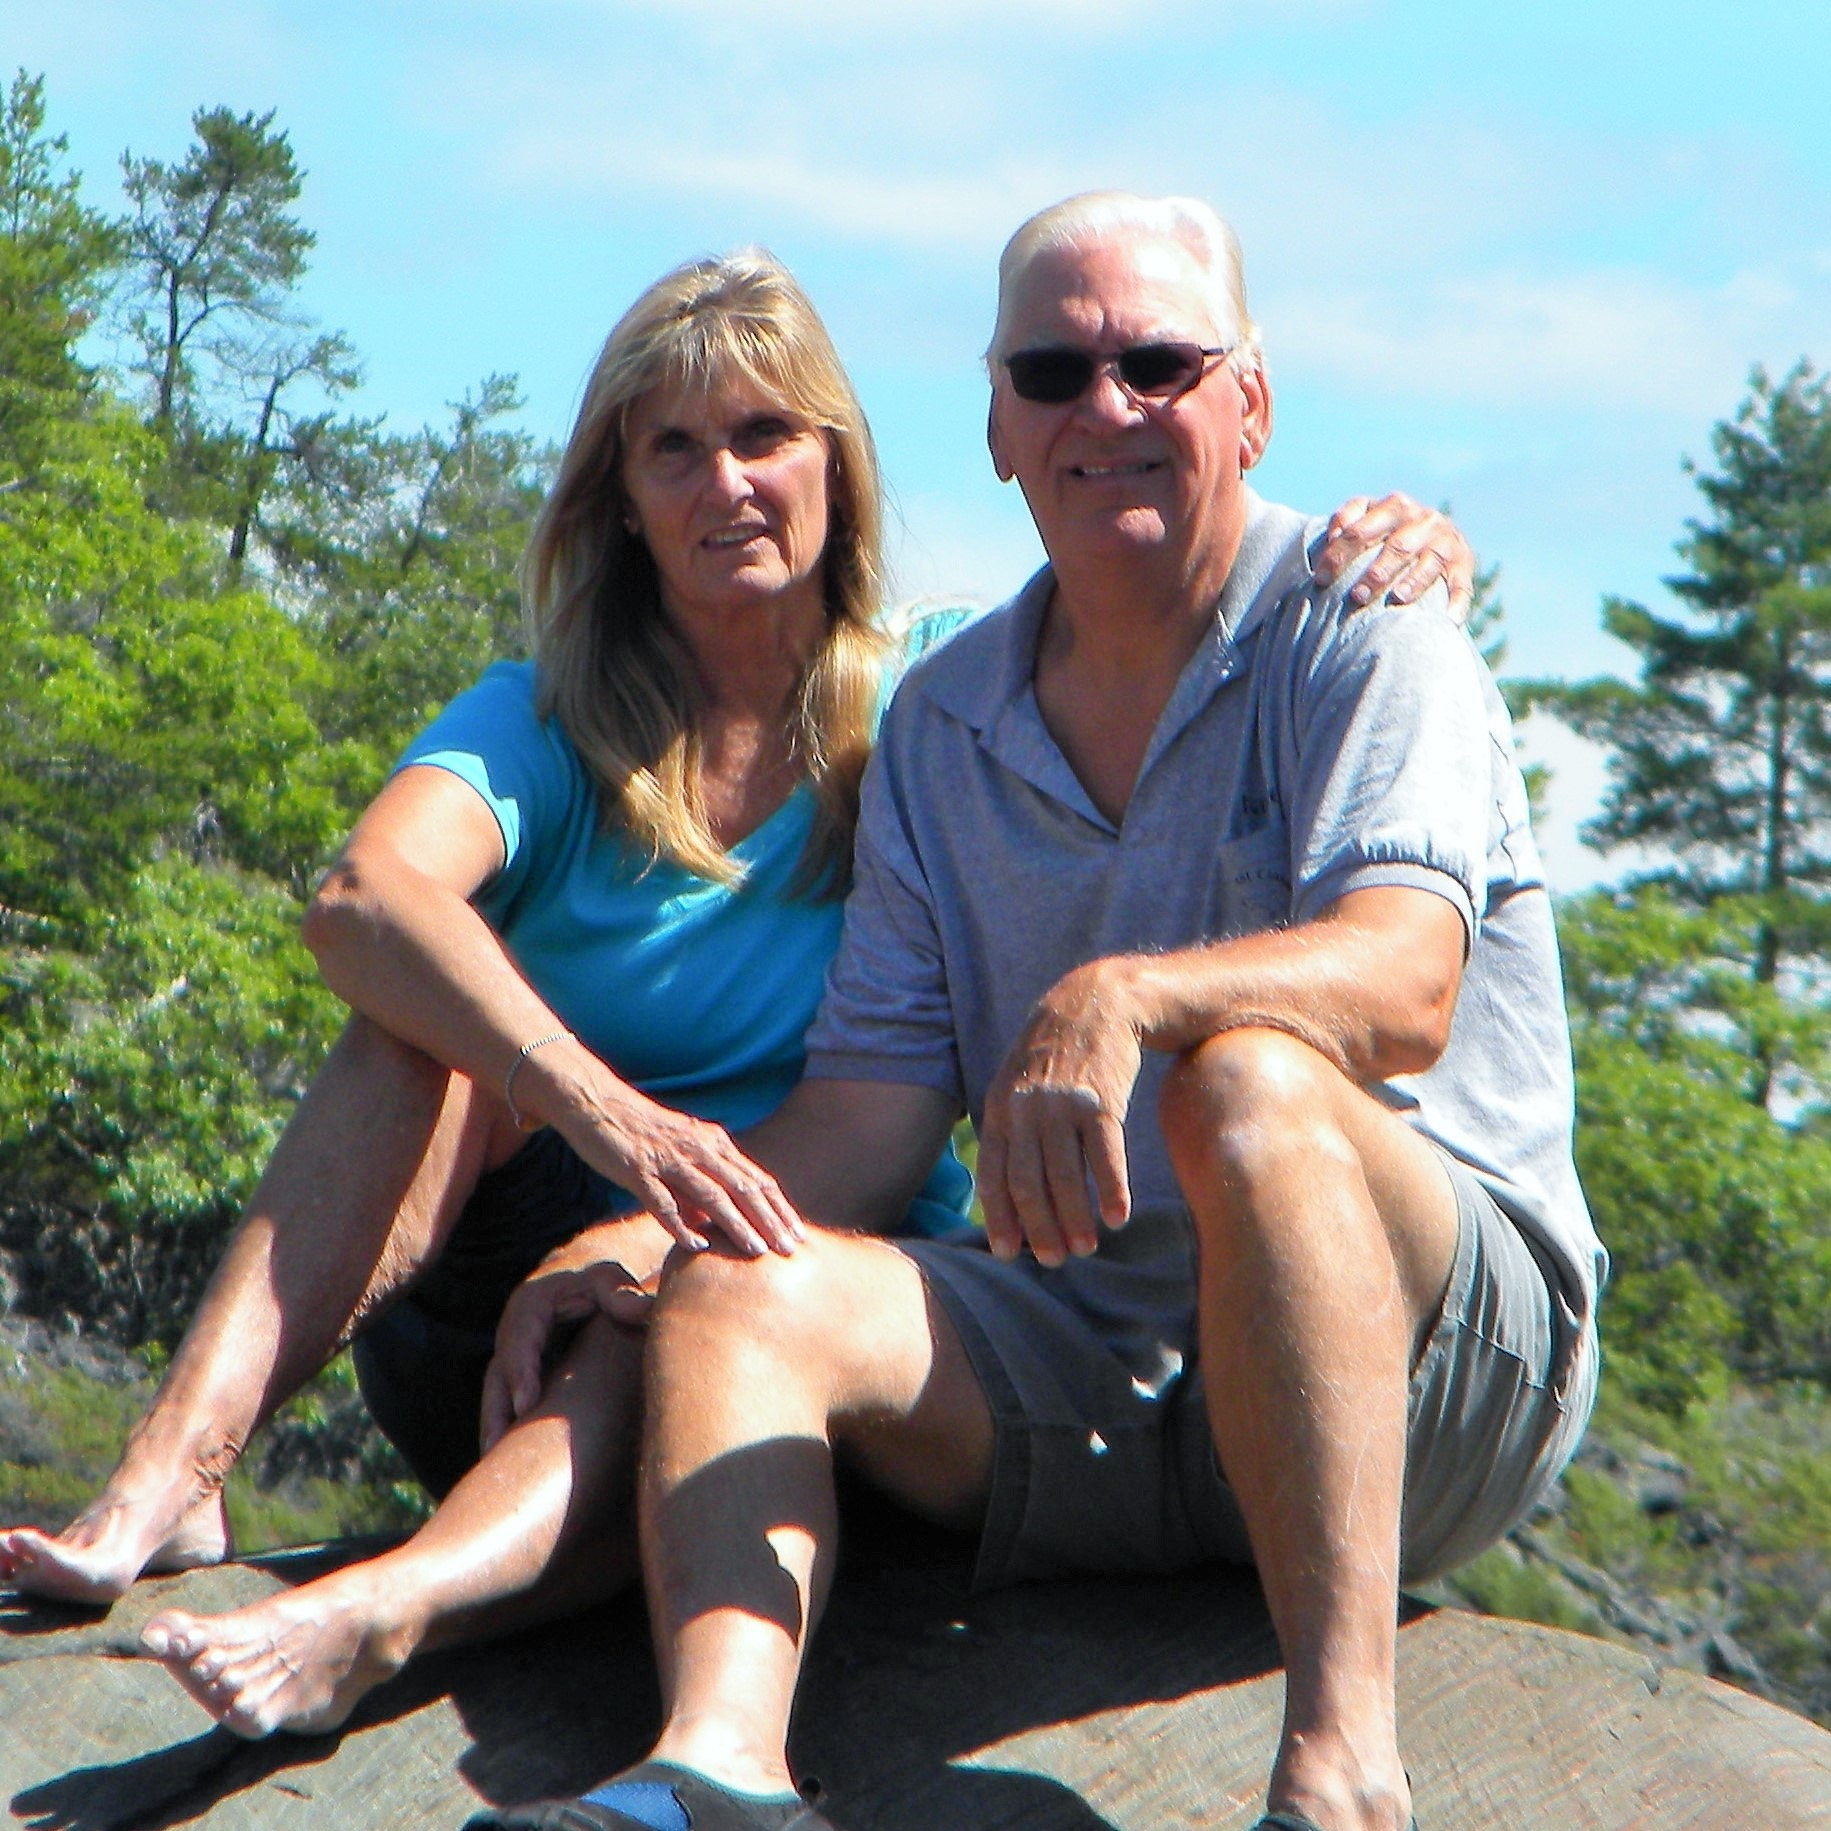 Jim and Sandee Portenga & Family